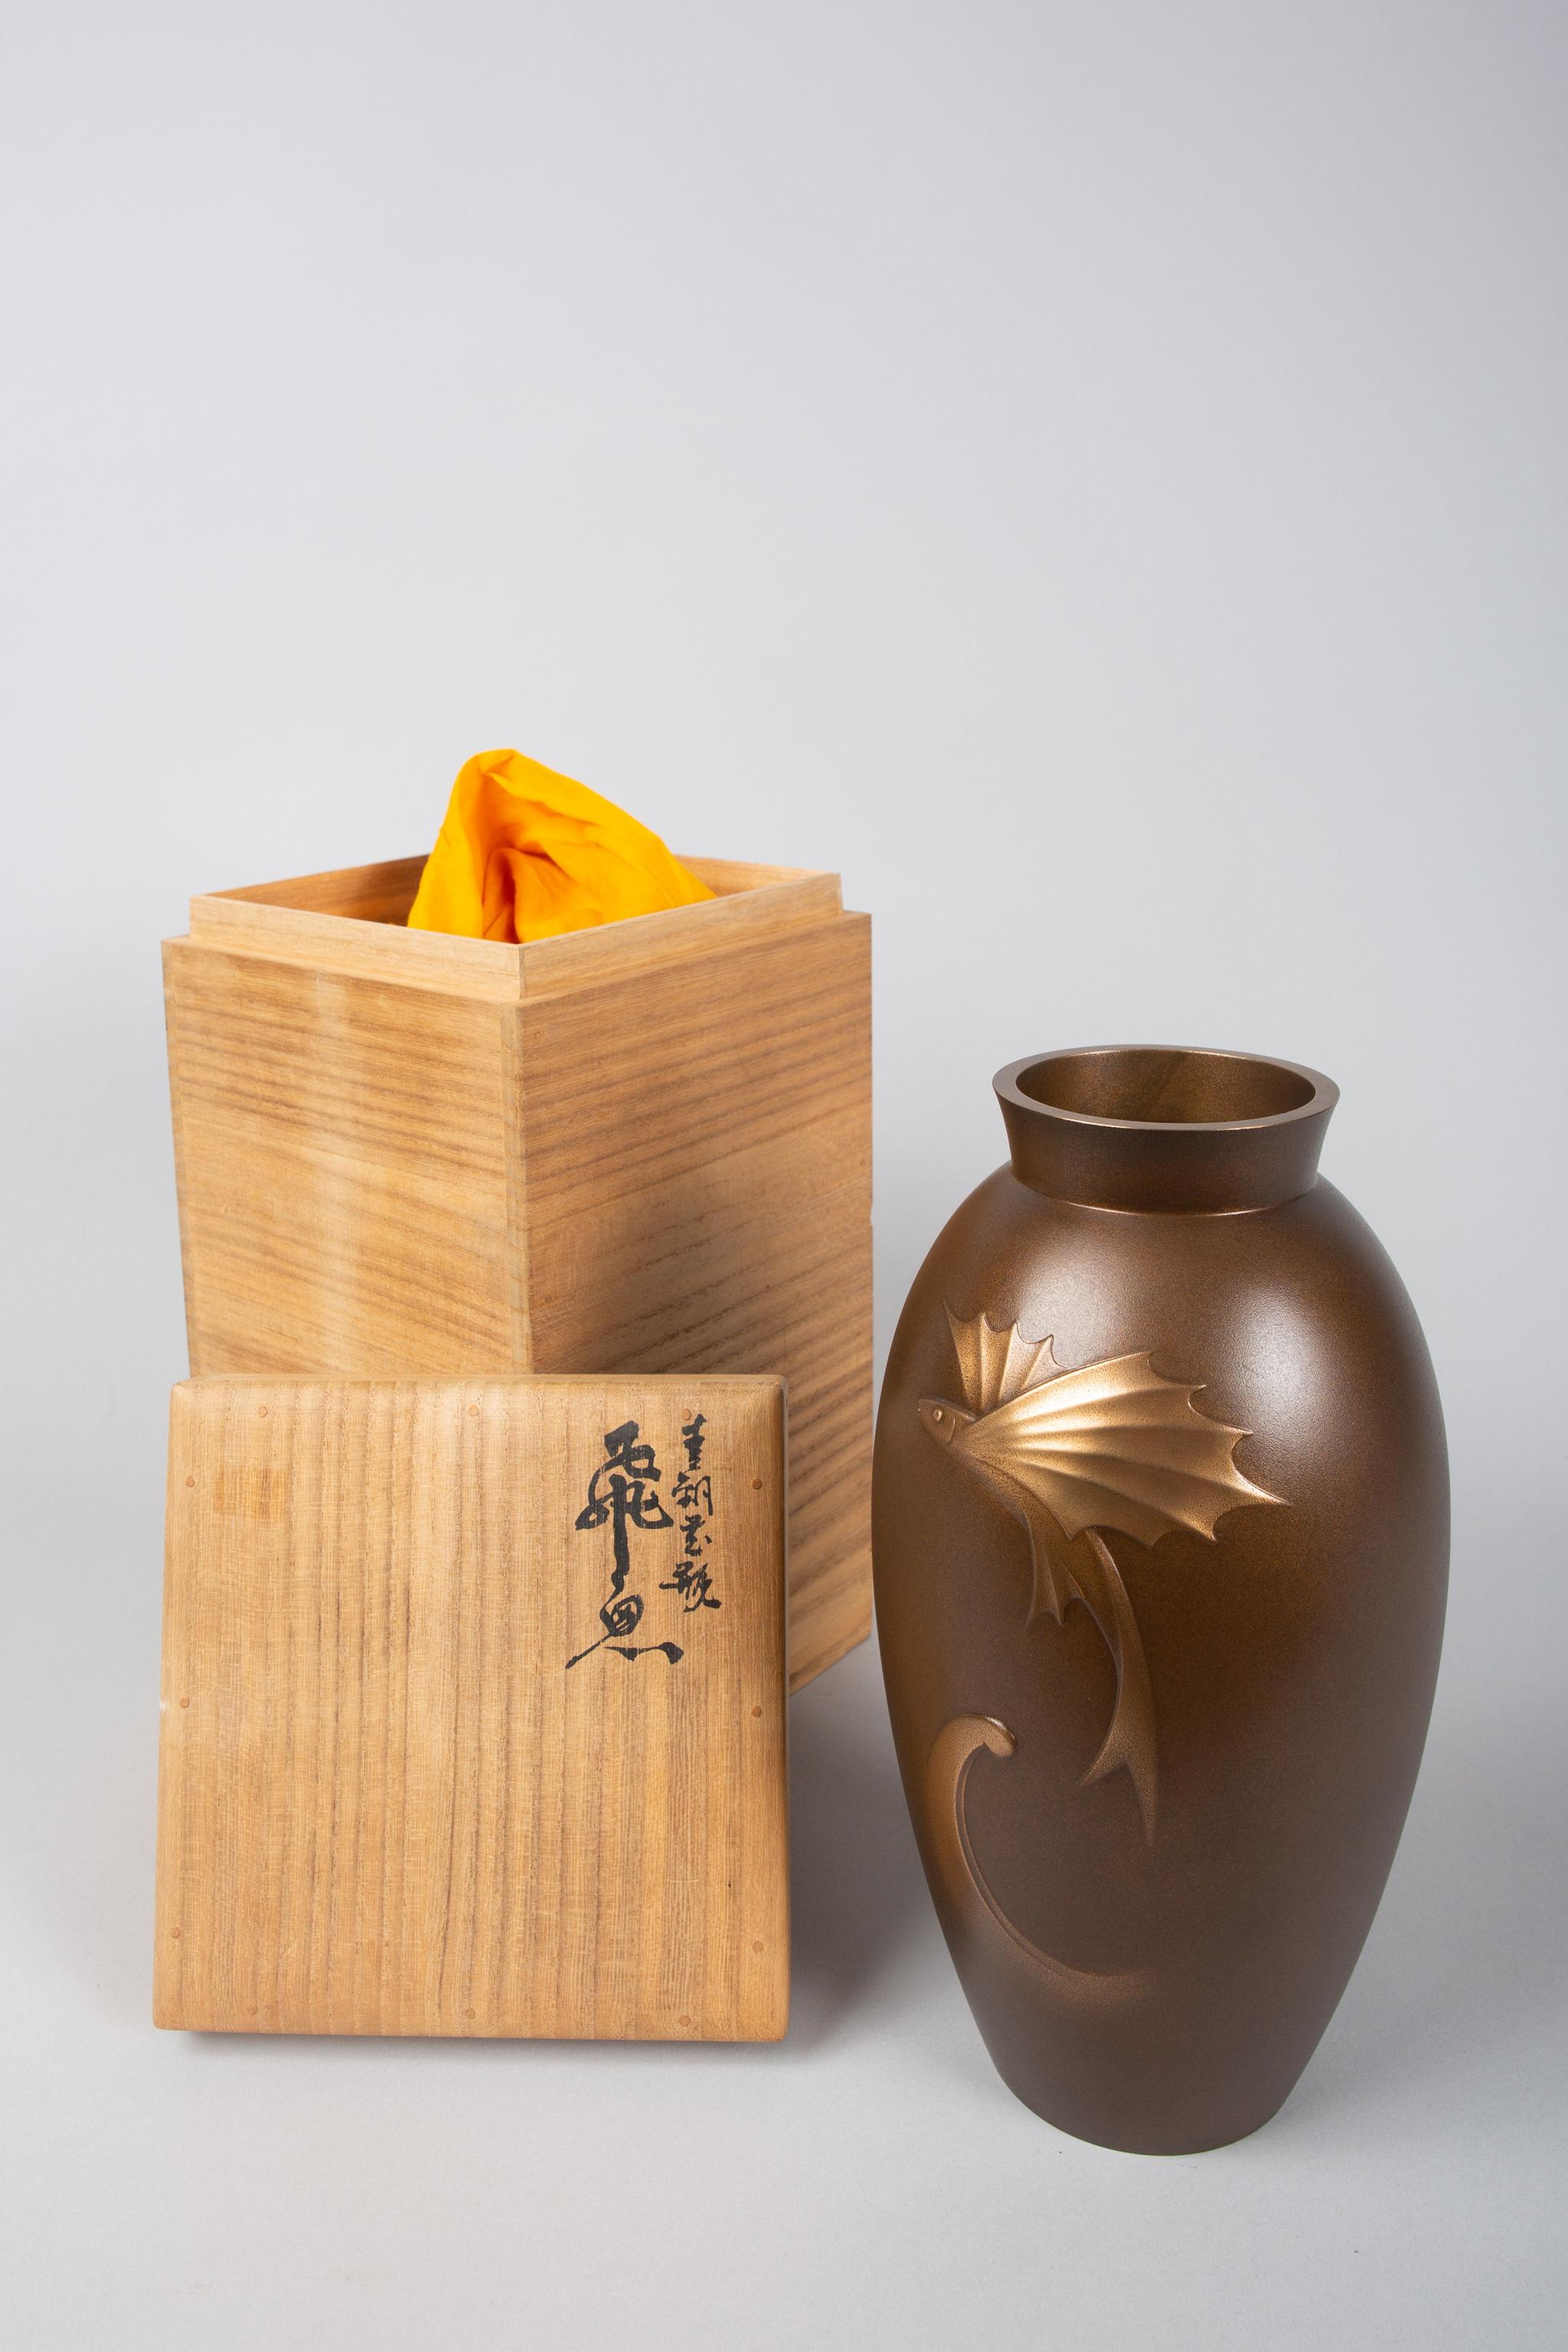 Japanese Bronze Vase with Flying Fish Design